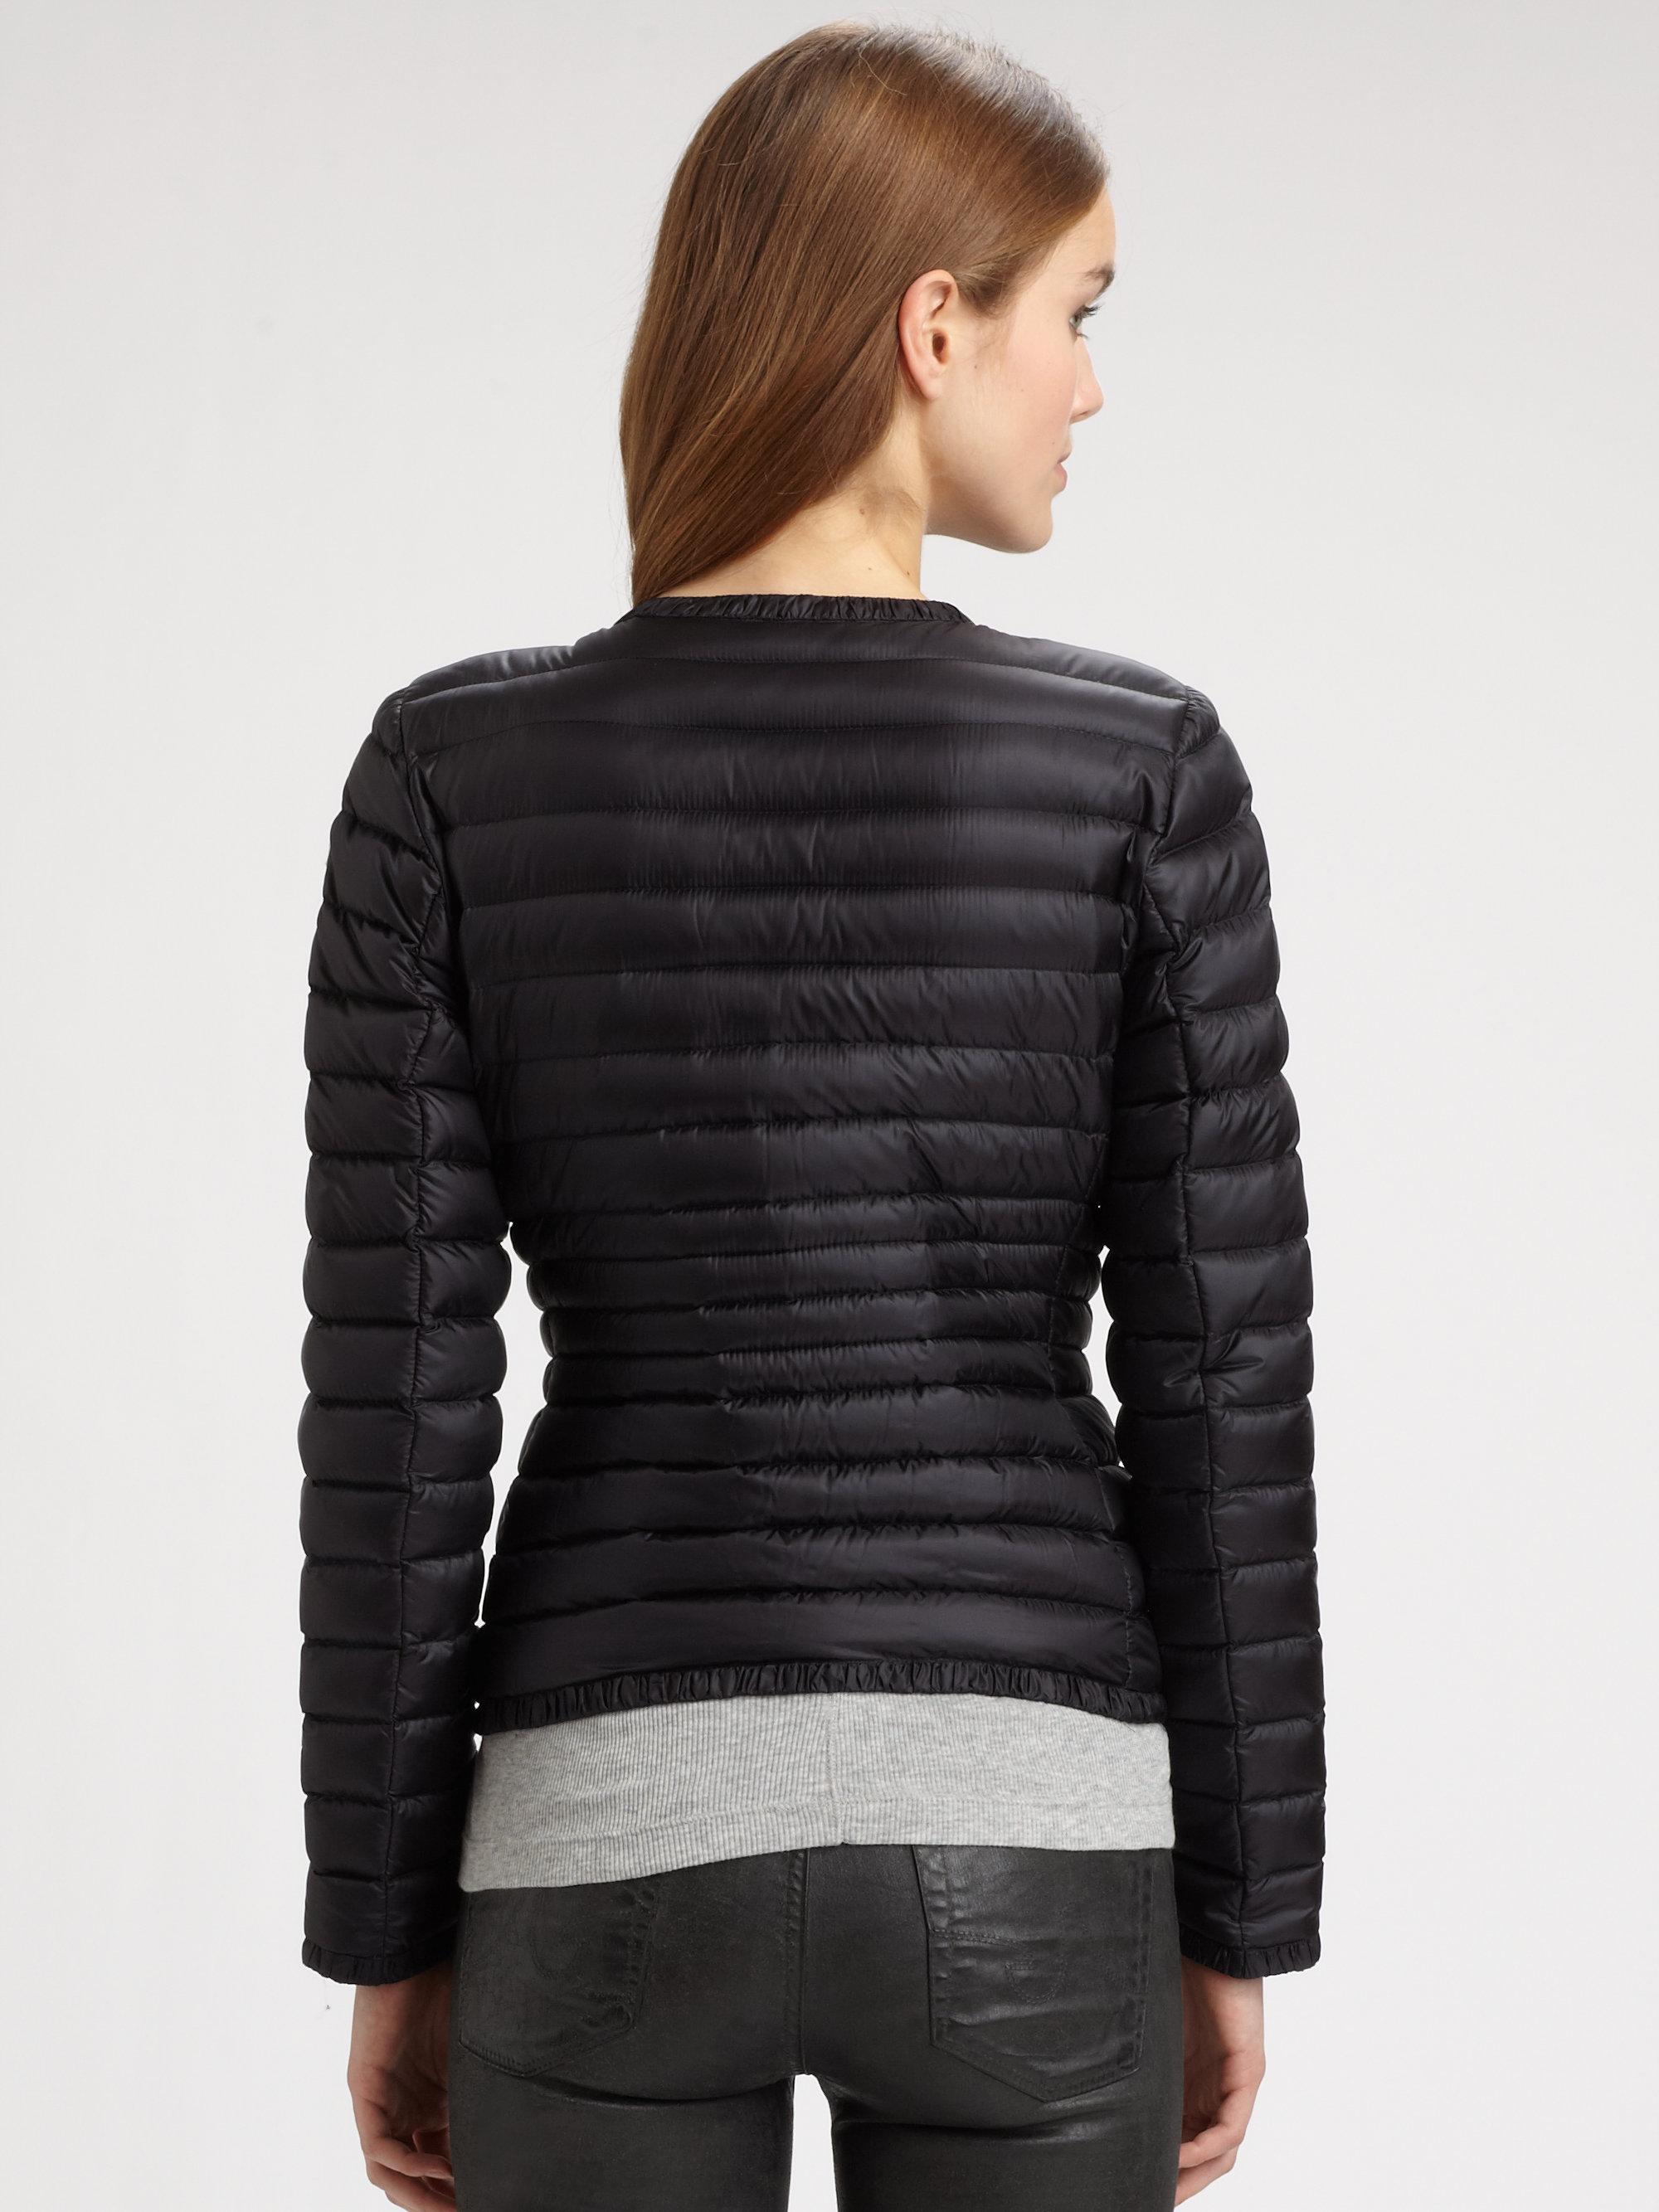 Lyst Moncler Ladis Longue Season Jacket In Black